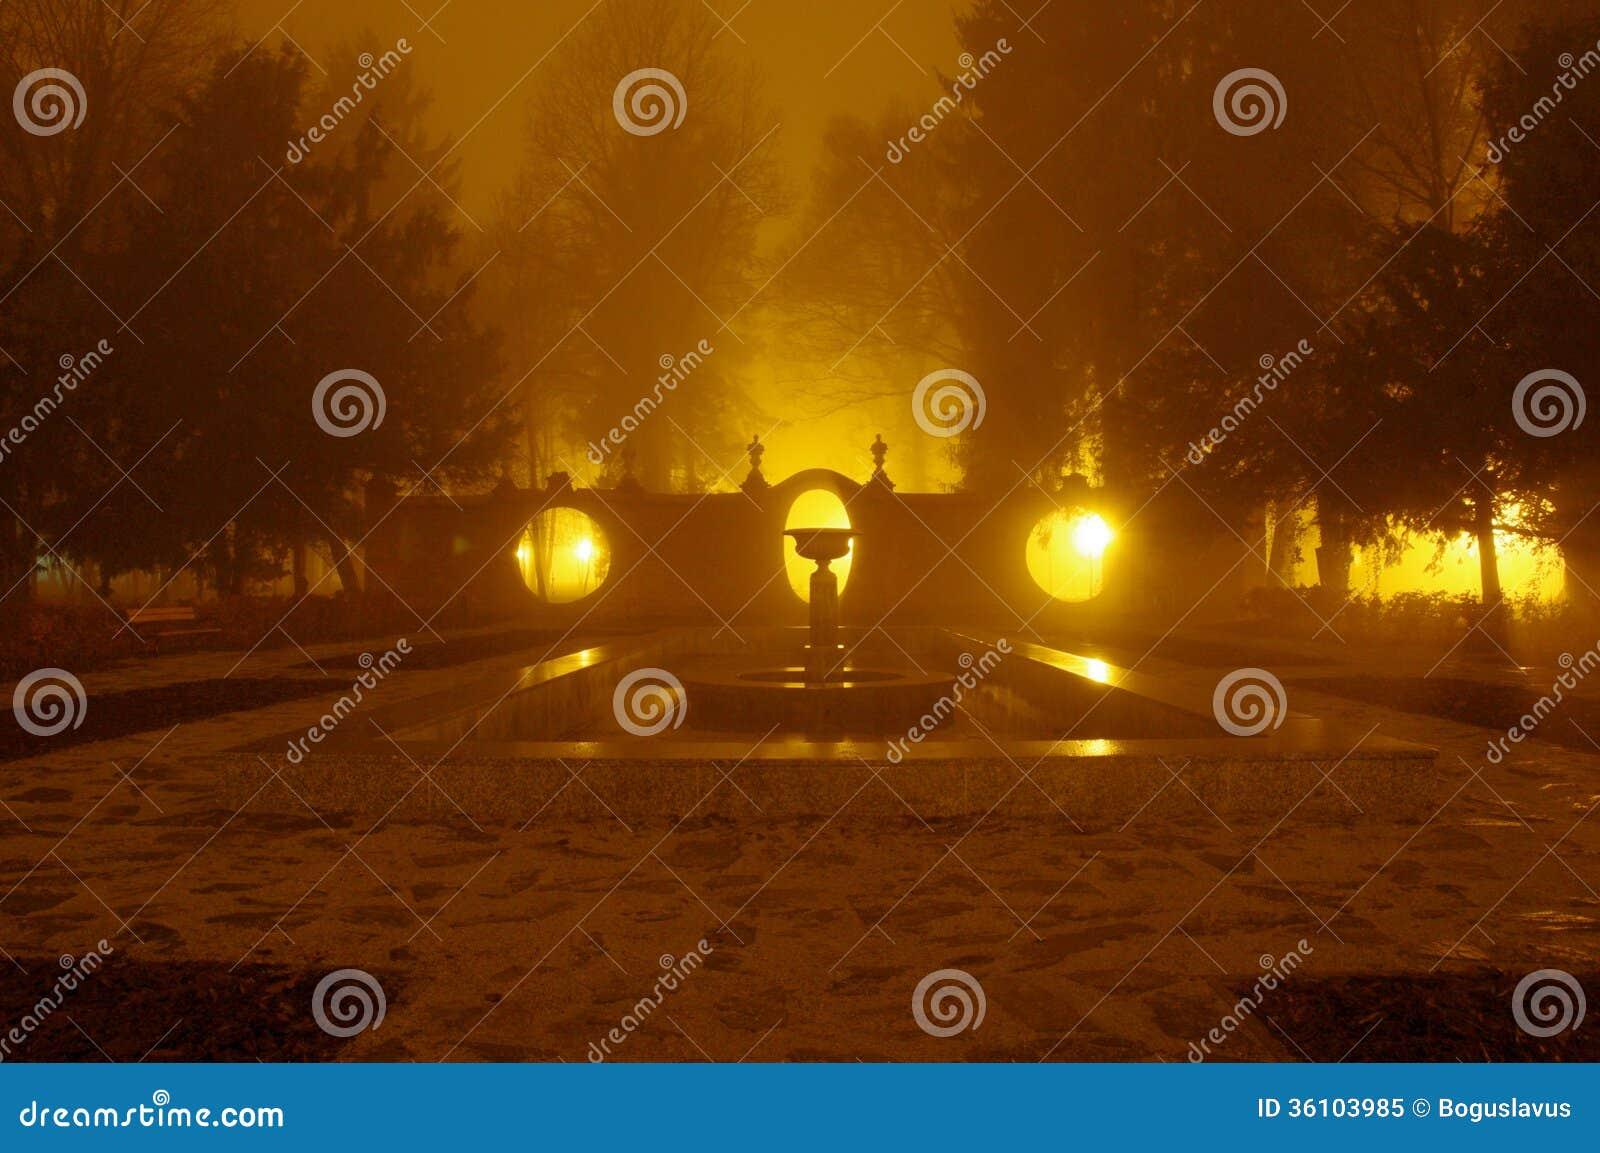 Park at night.